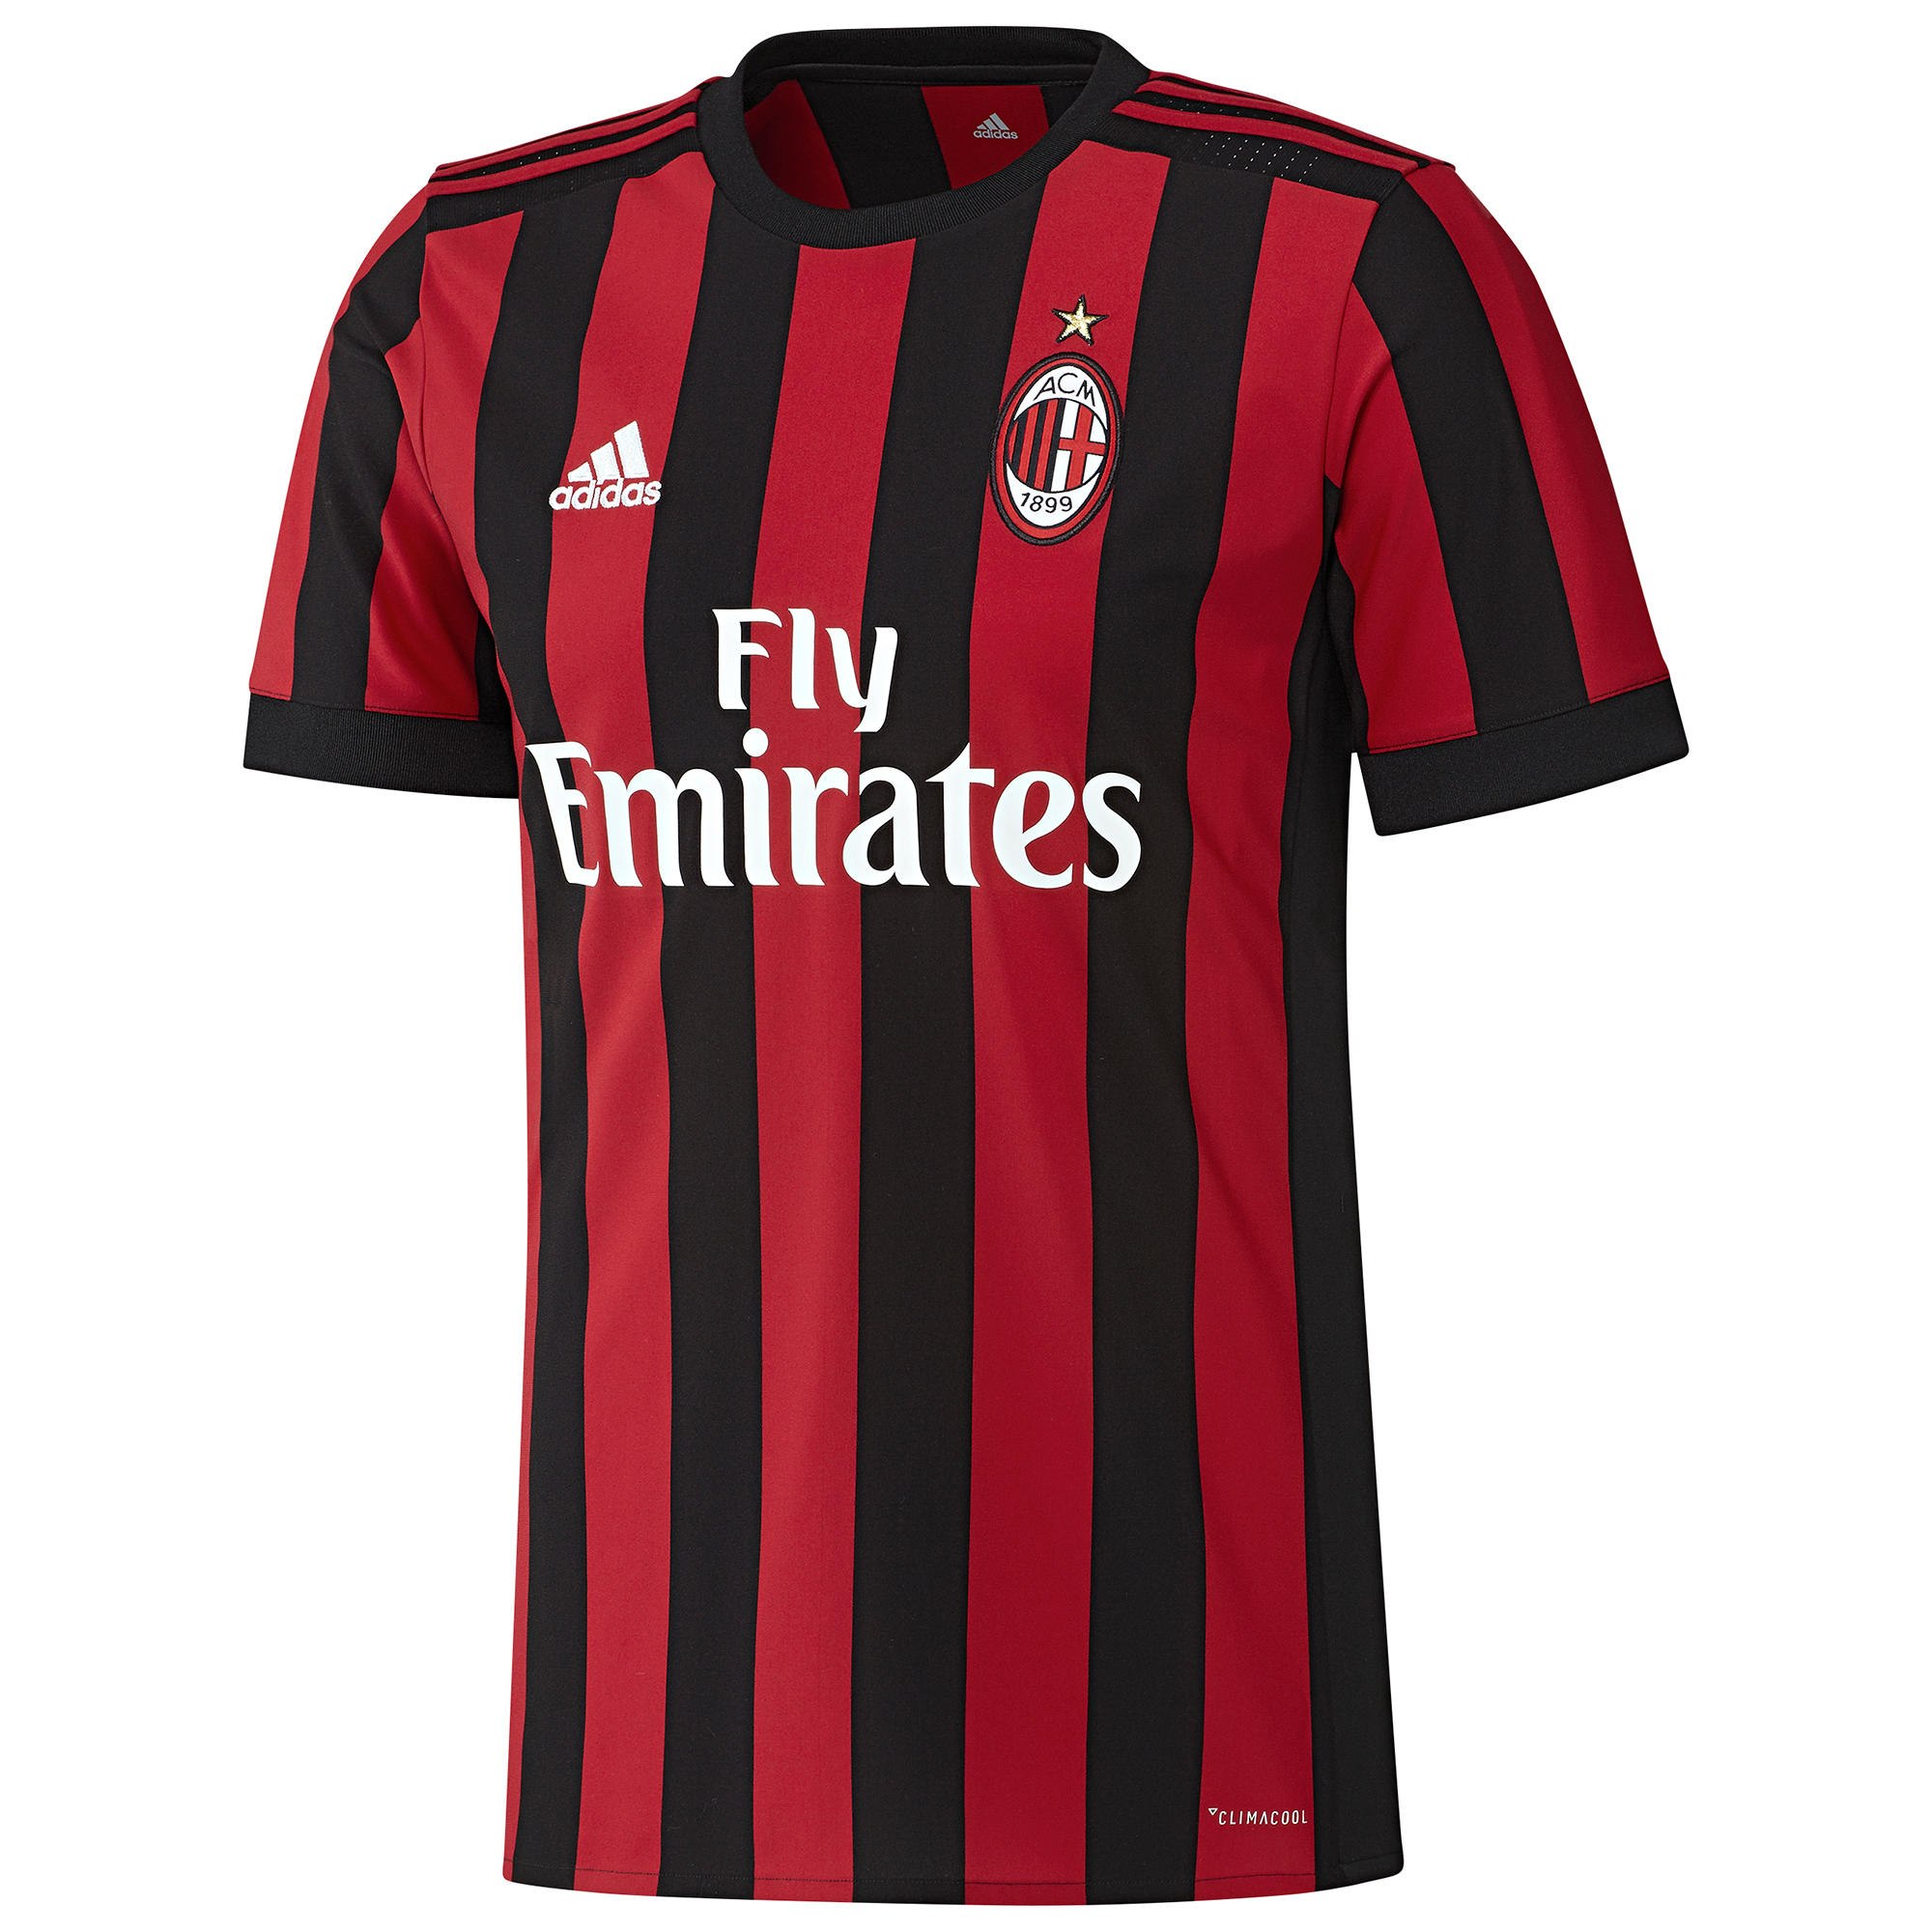 Adidas Voetbalshirt AC Milan thuisshirt 17/18 voor volwassenen zwart/rood